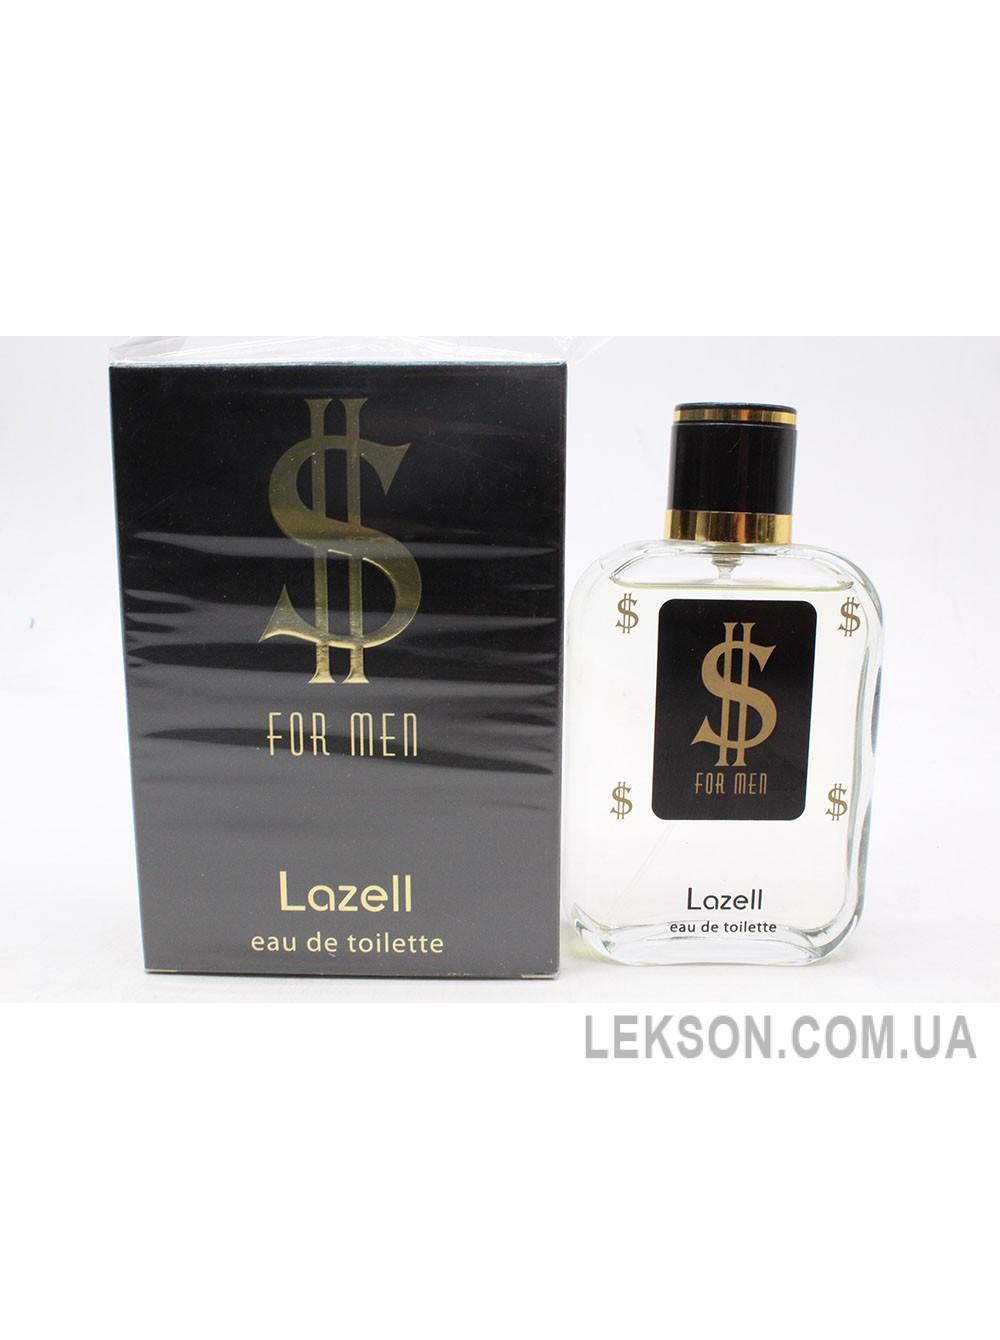 Мужской парфюм тестер: La-104-110 100мл